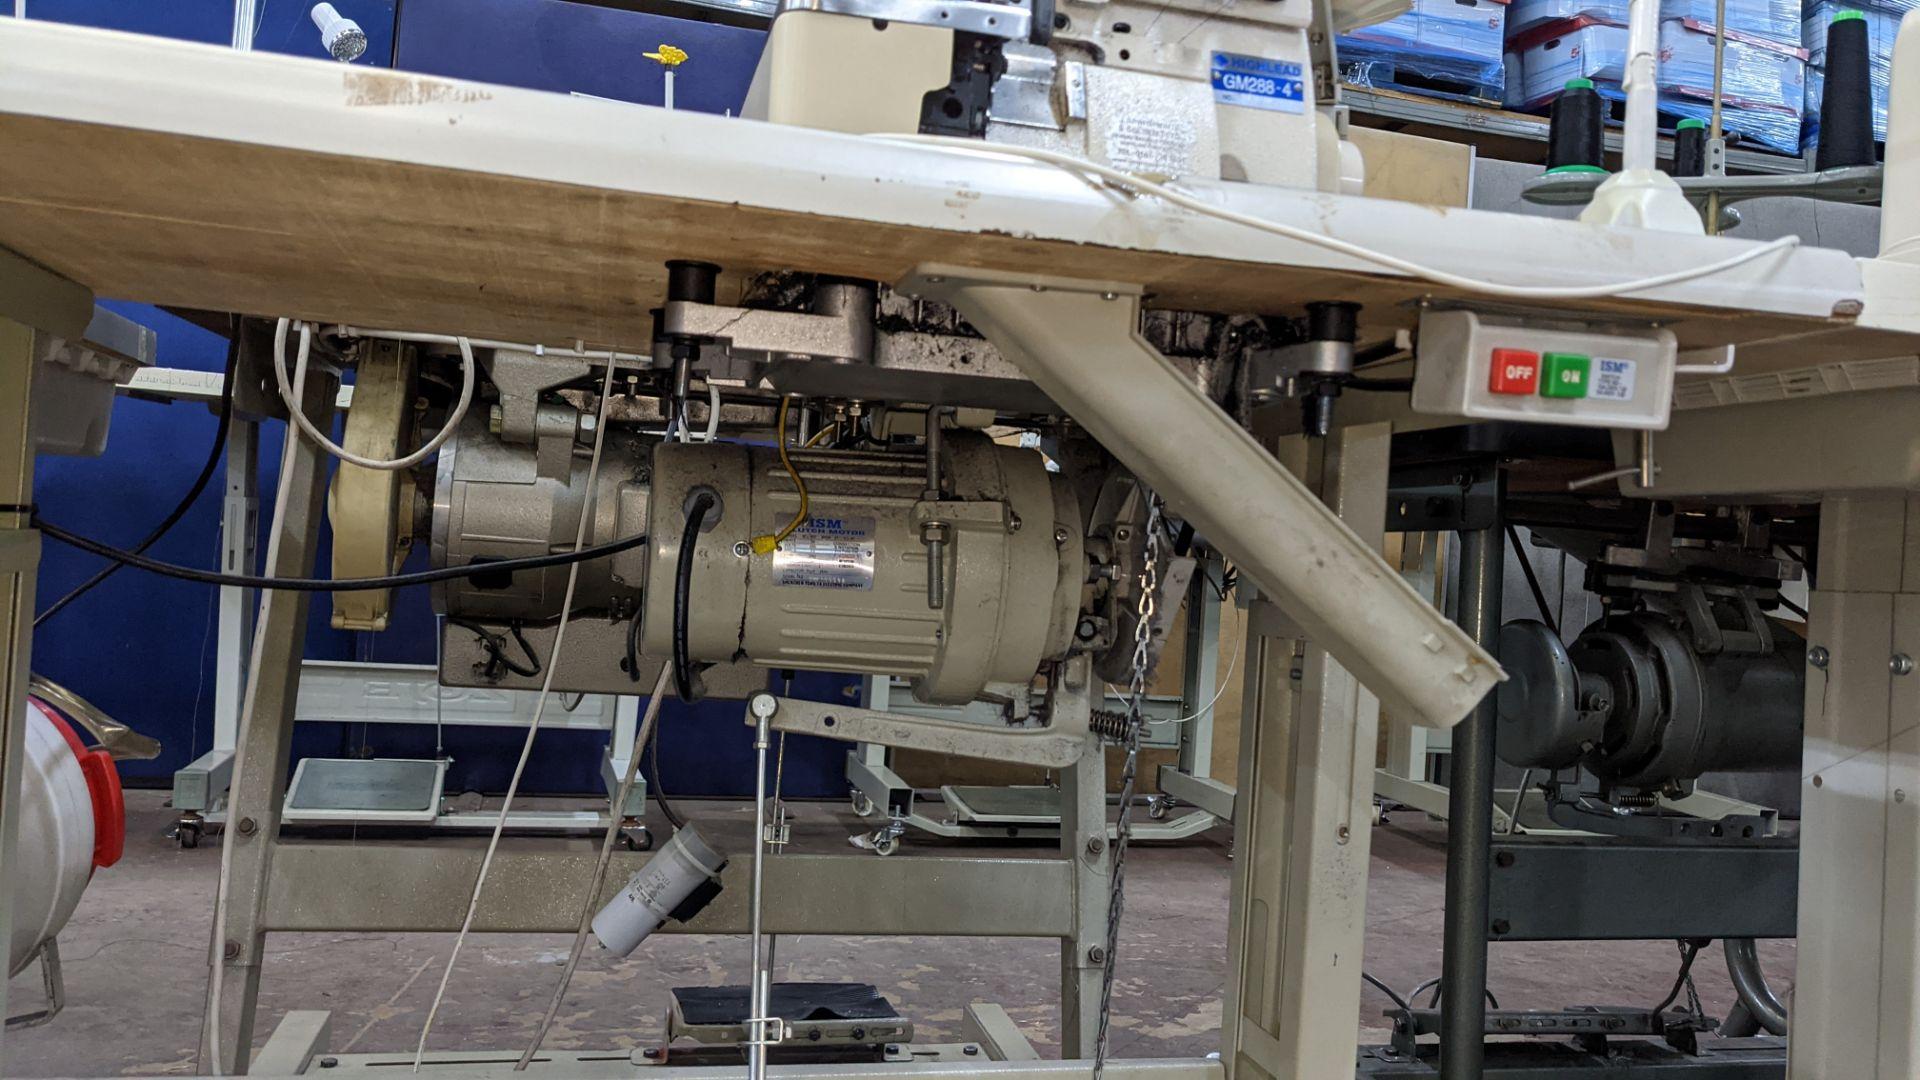 Highlead overlocker model GM288-4 - Image 15 of 16